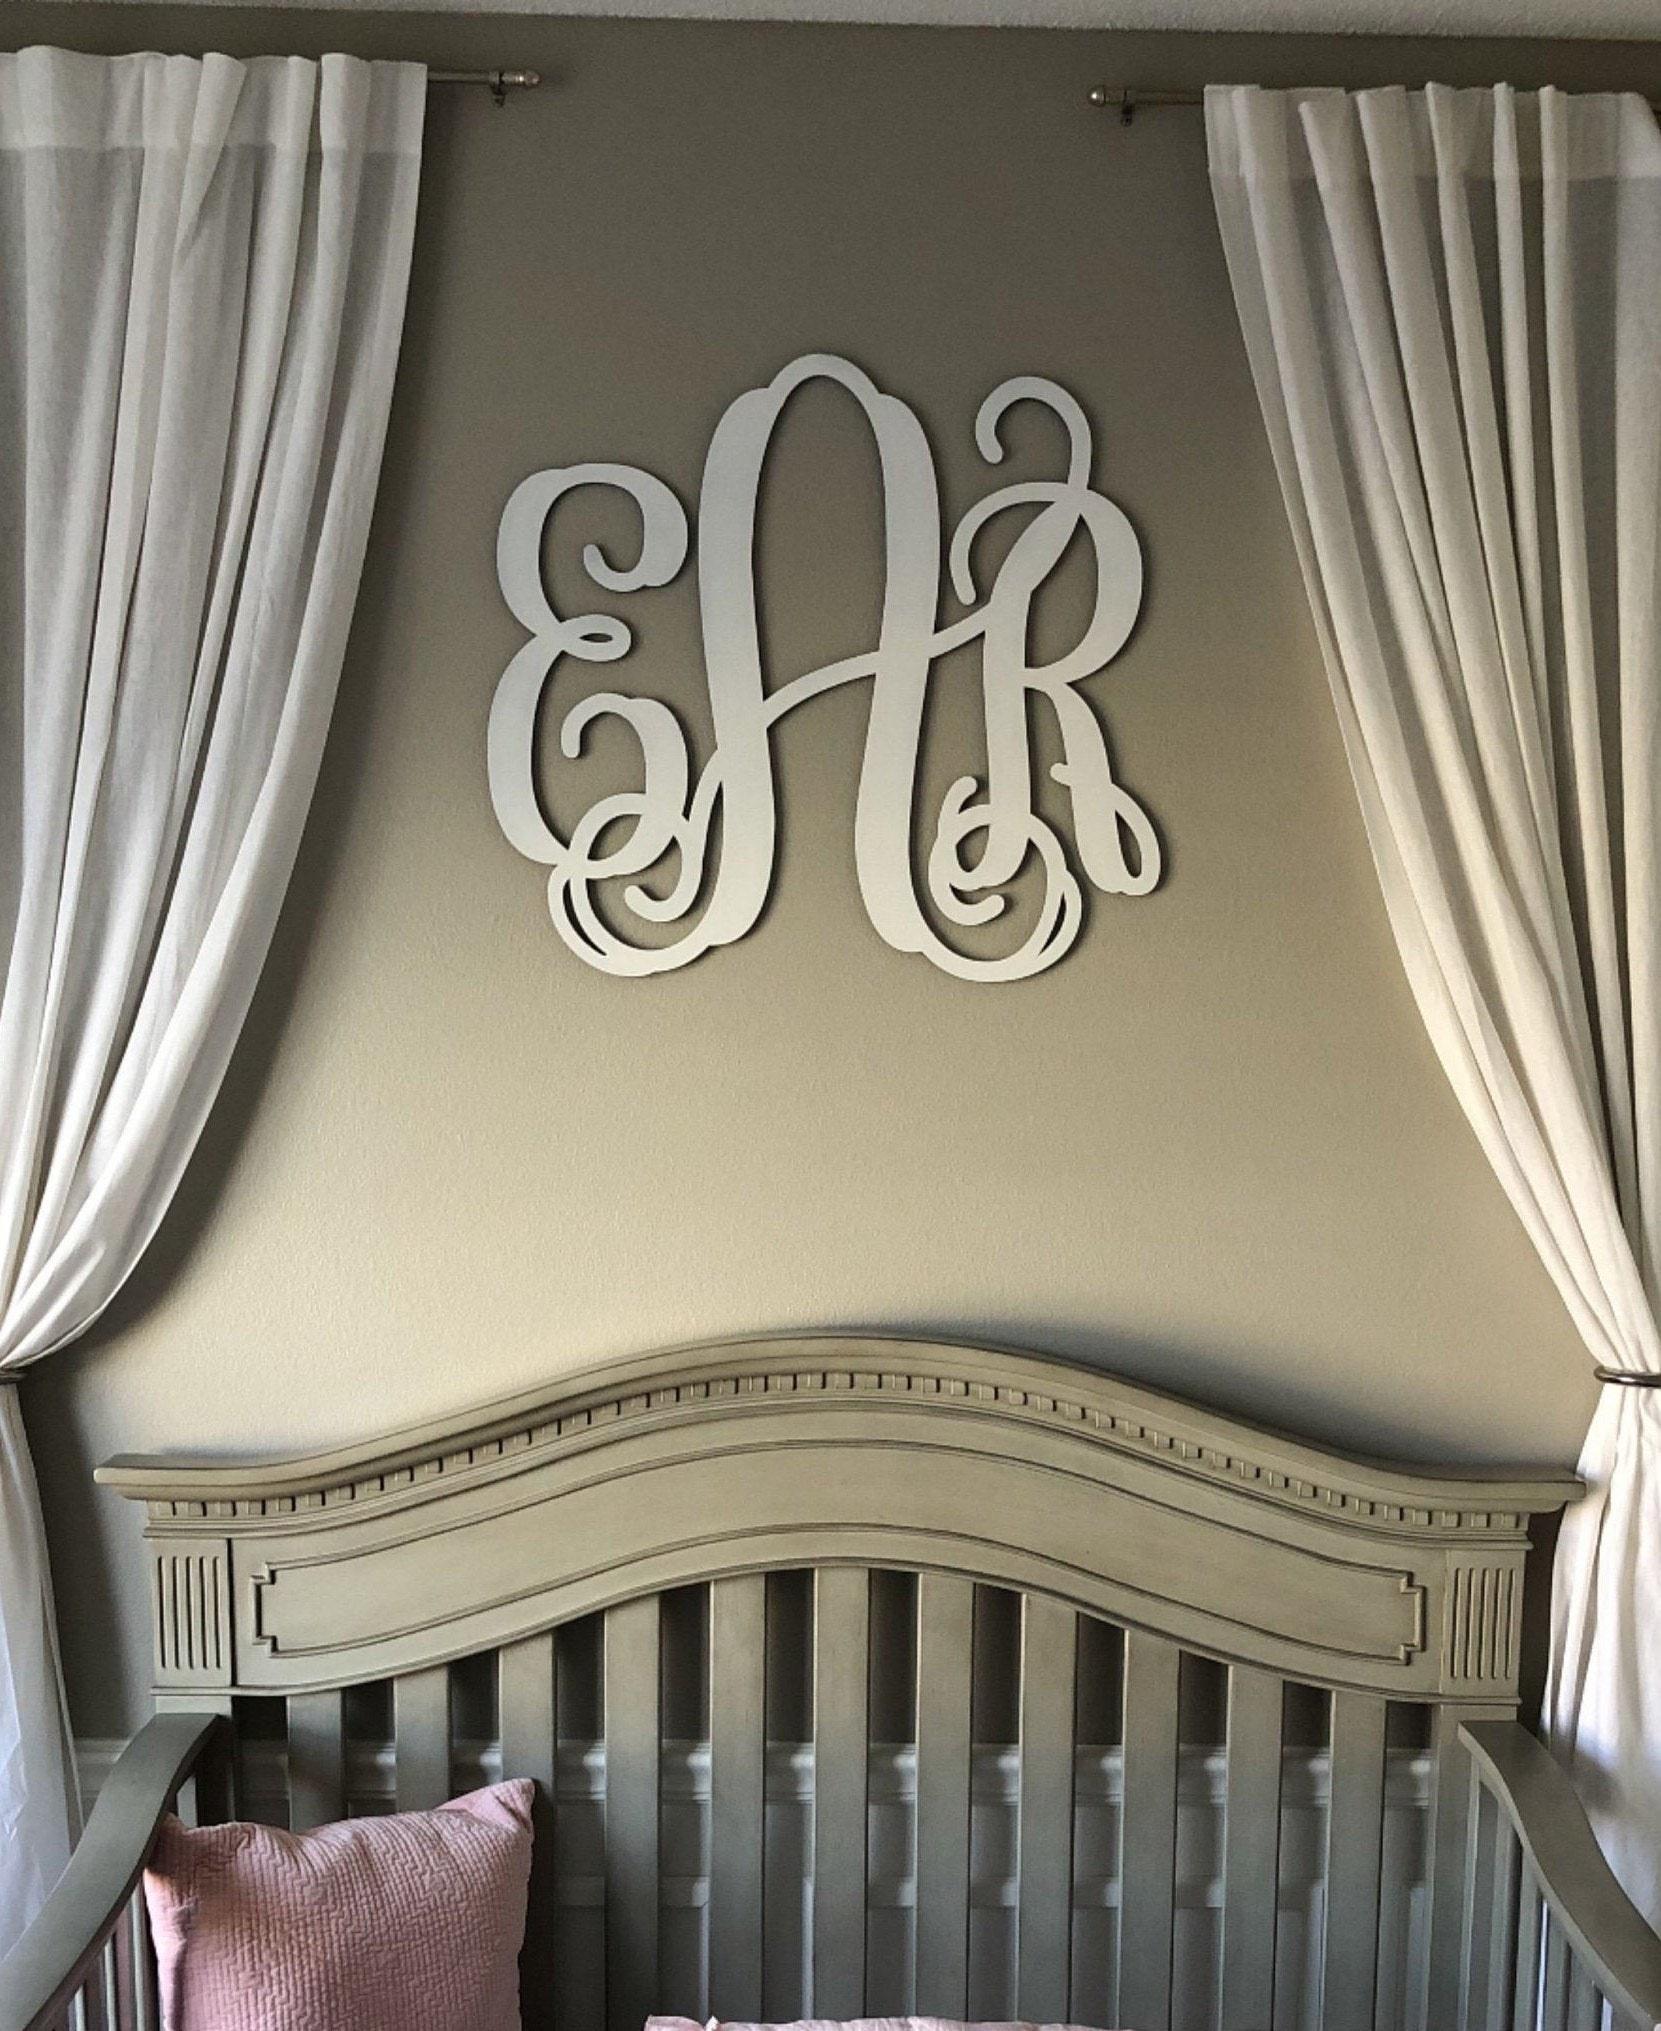 a white wooden monogram over a crib